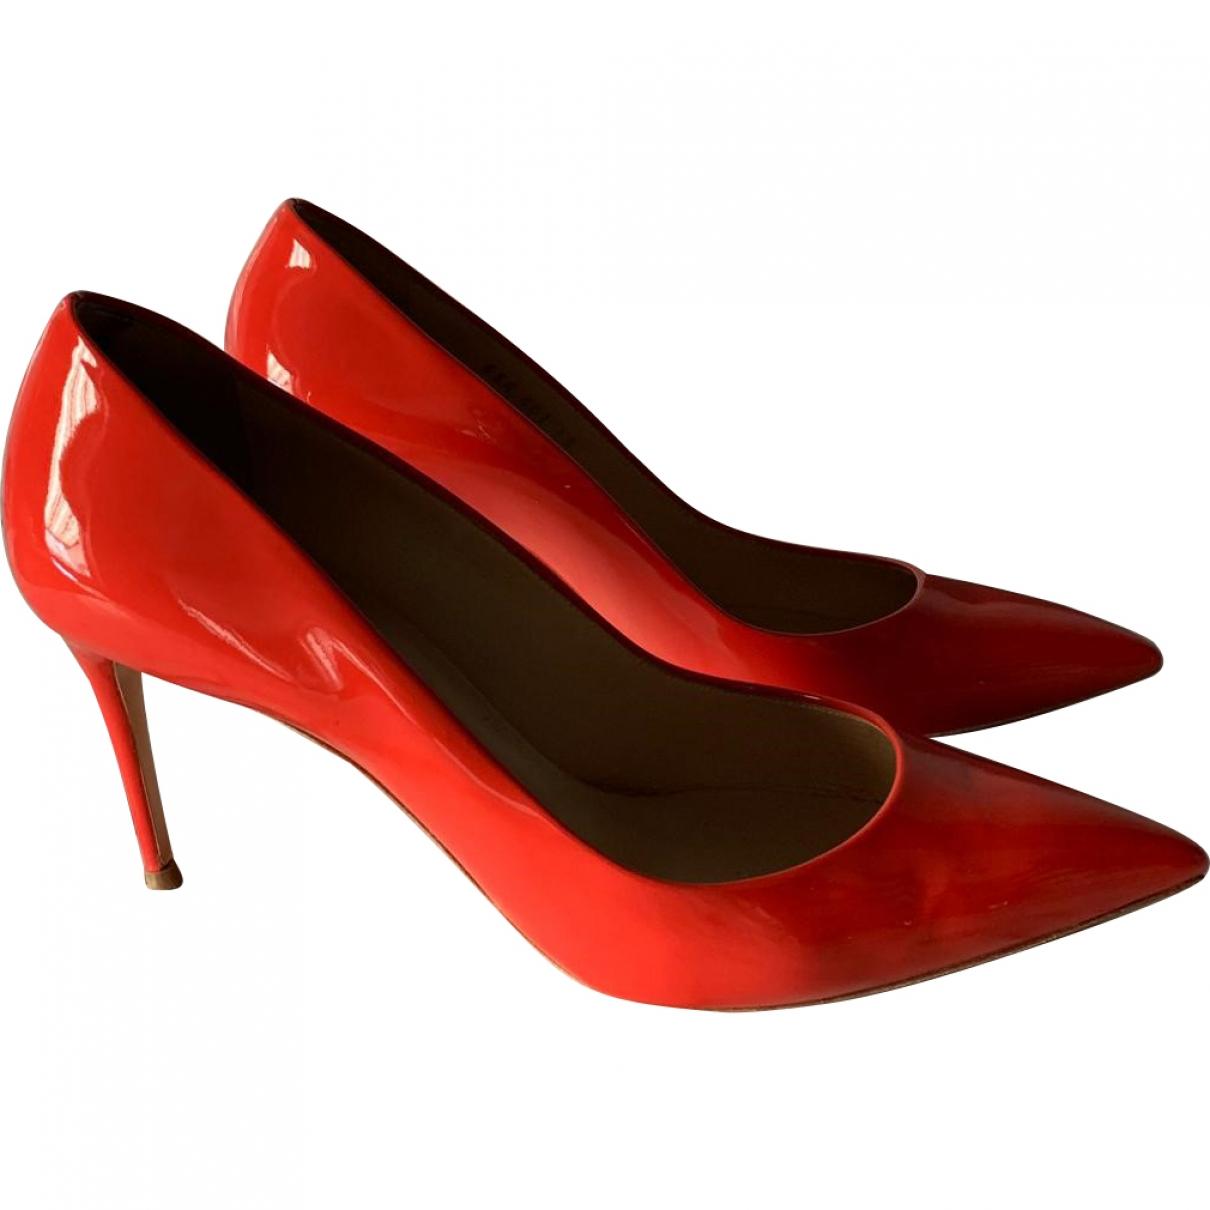 Casadei \N Orange Patent leather Heels for Women 39 EU